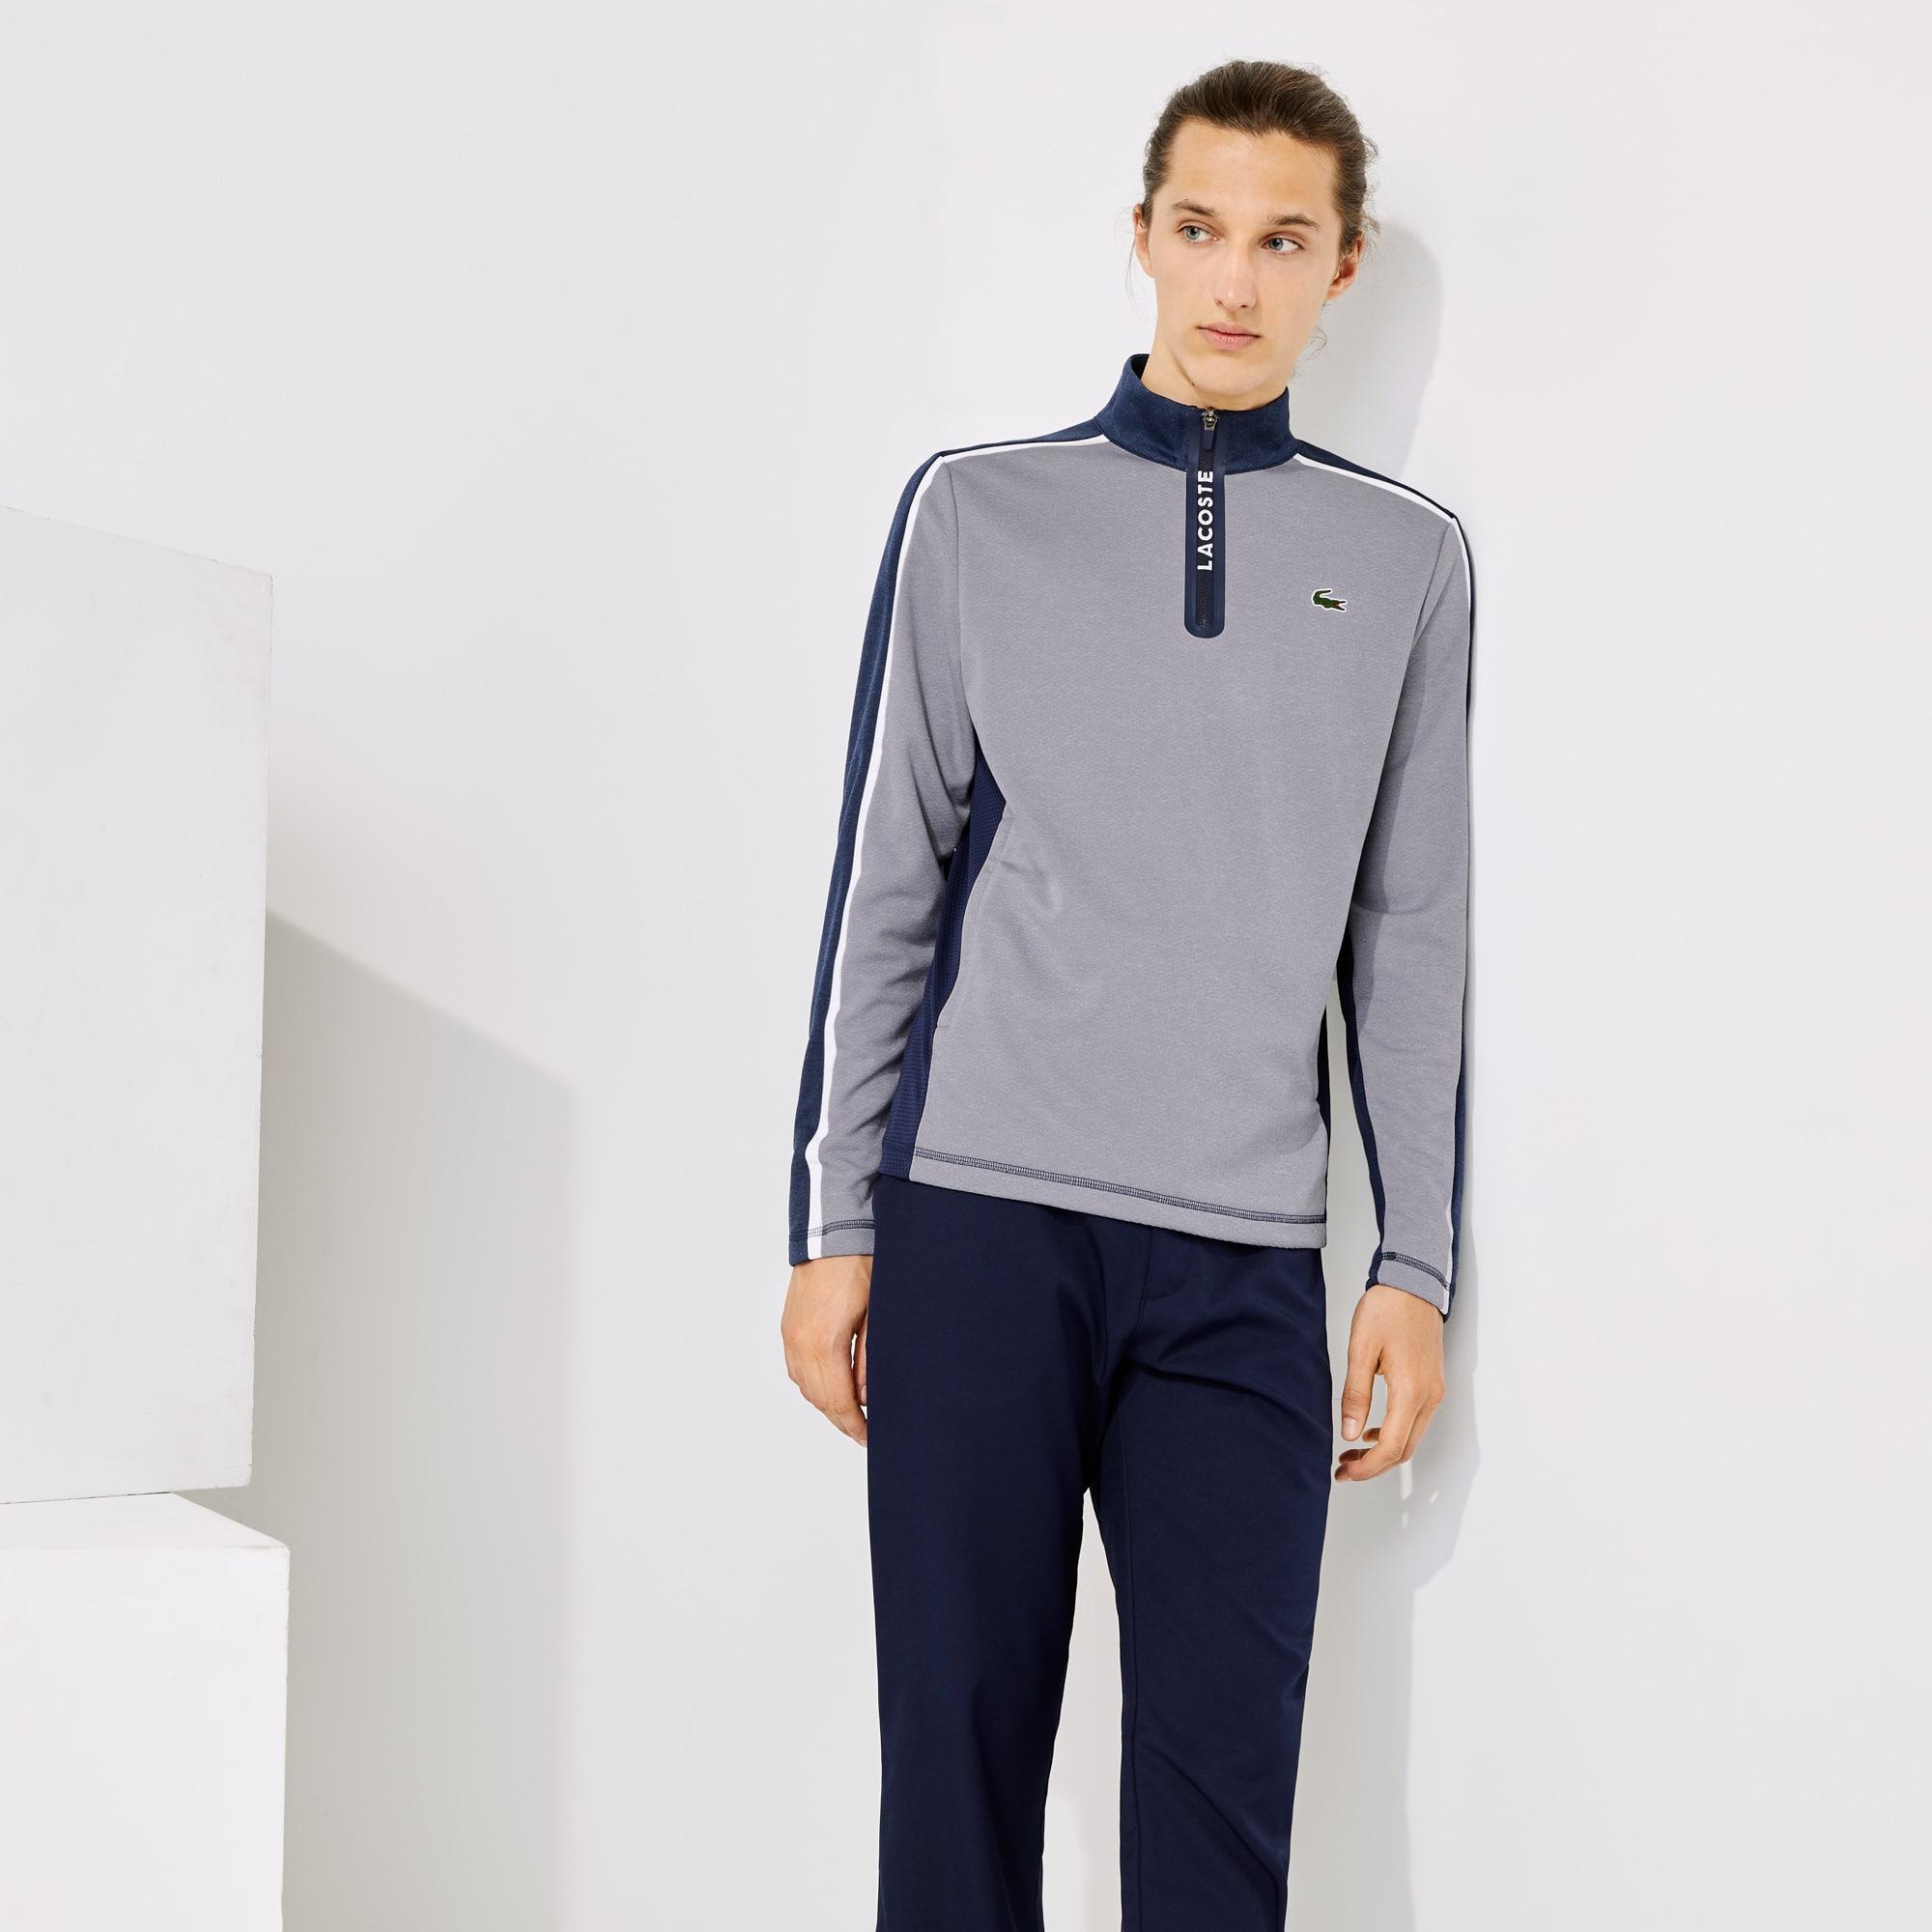 Lacoste Mens SPORT Zip Stand-Up Collar Stretch Golf Sweatshirt